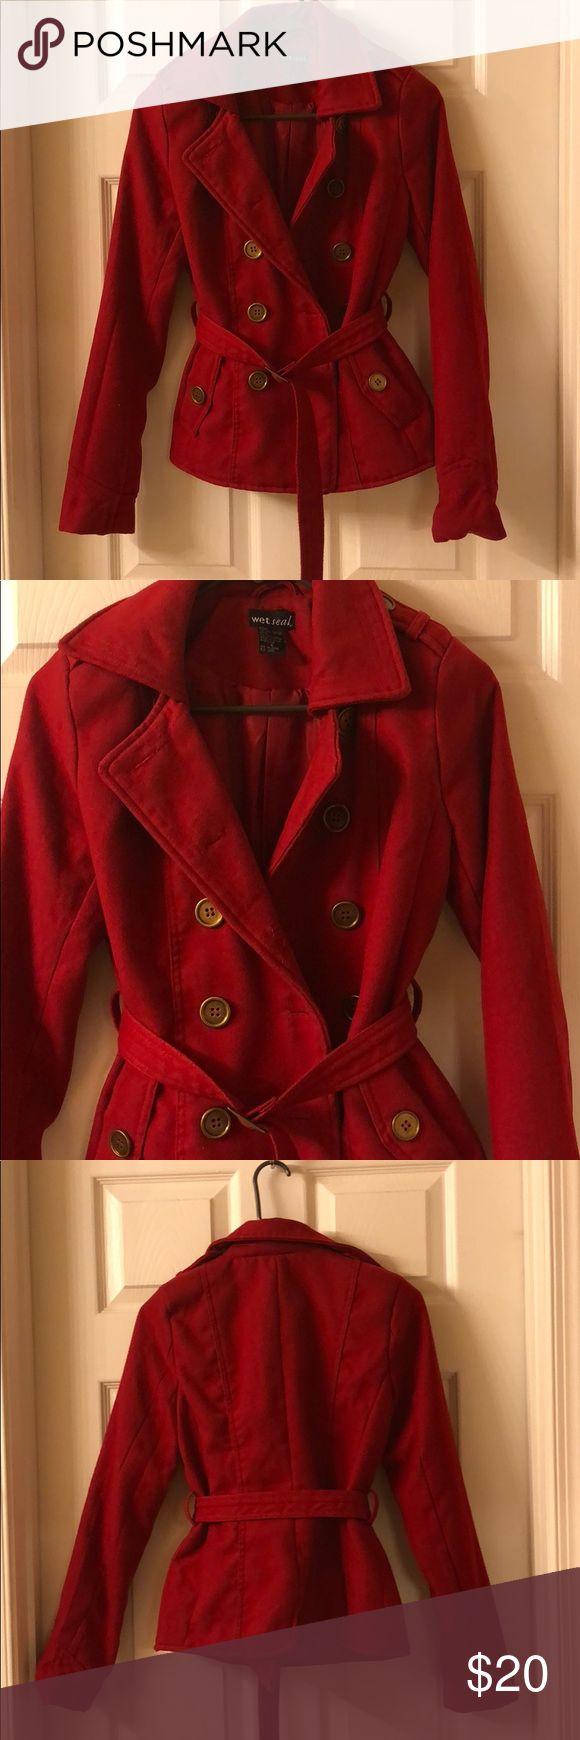 Wet seal Red Pea coat Red Pea coat in great condition Wet Seal Jackets & Coats Pea Coats